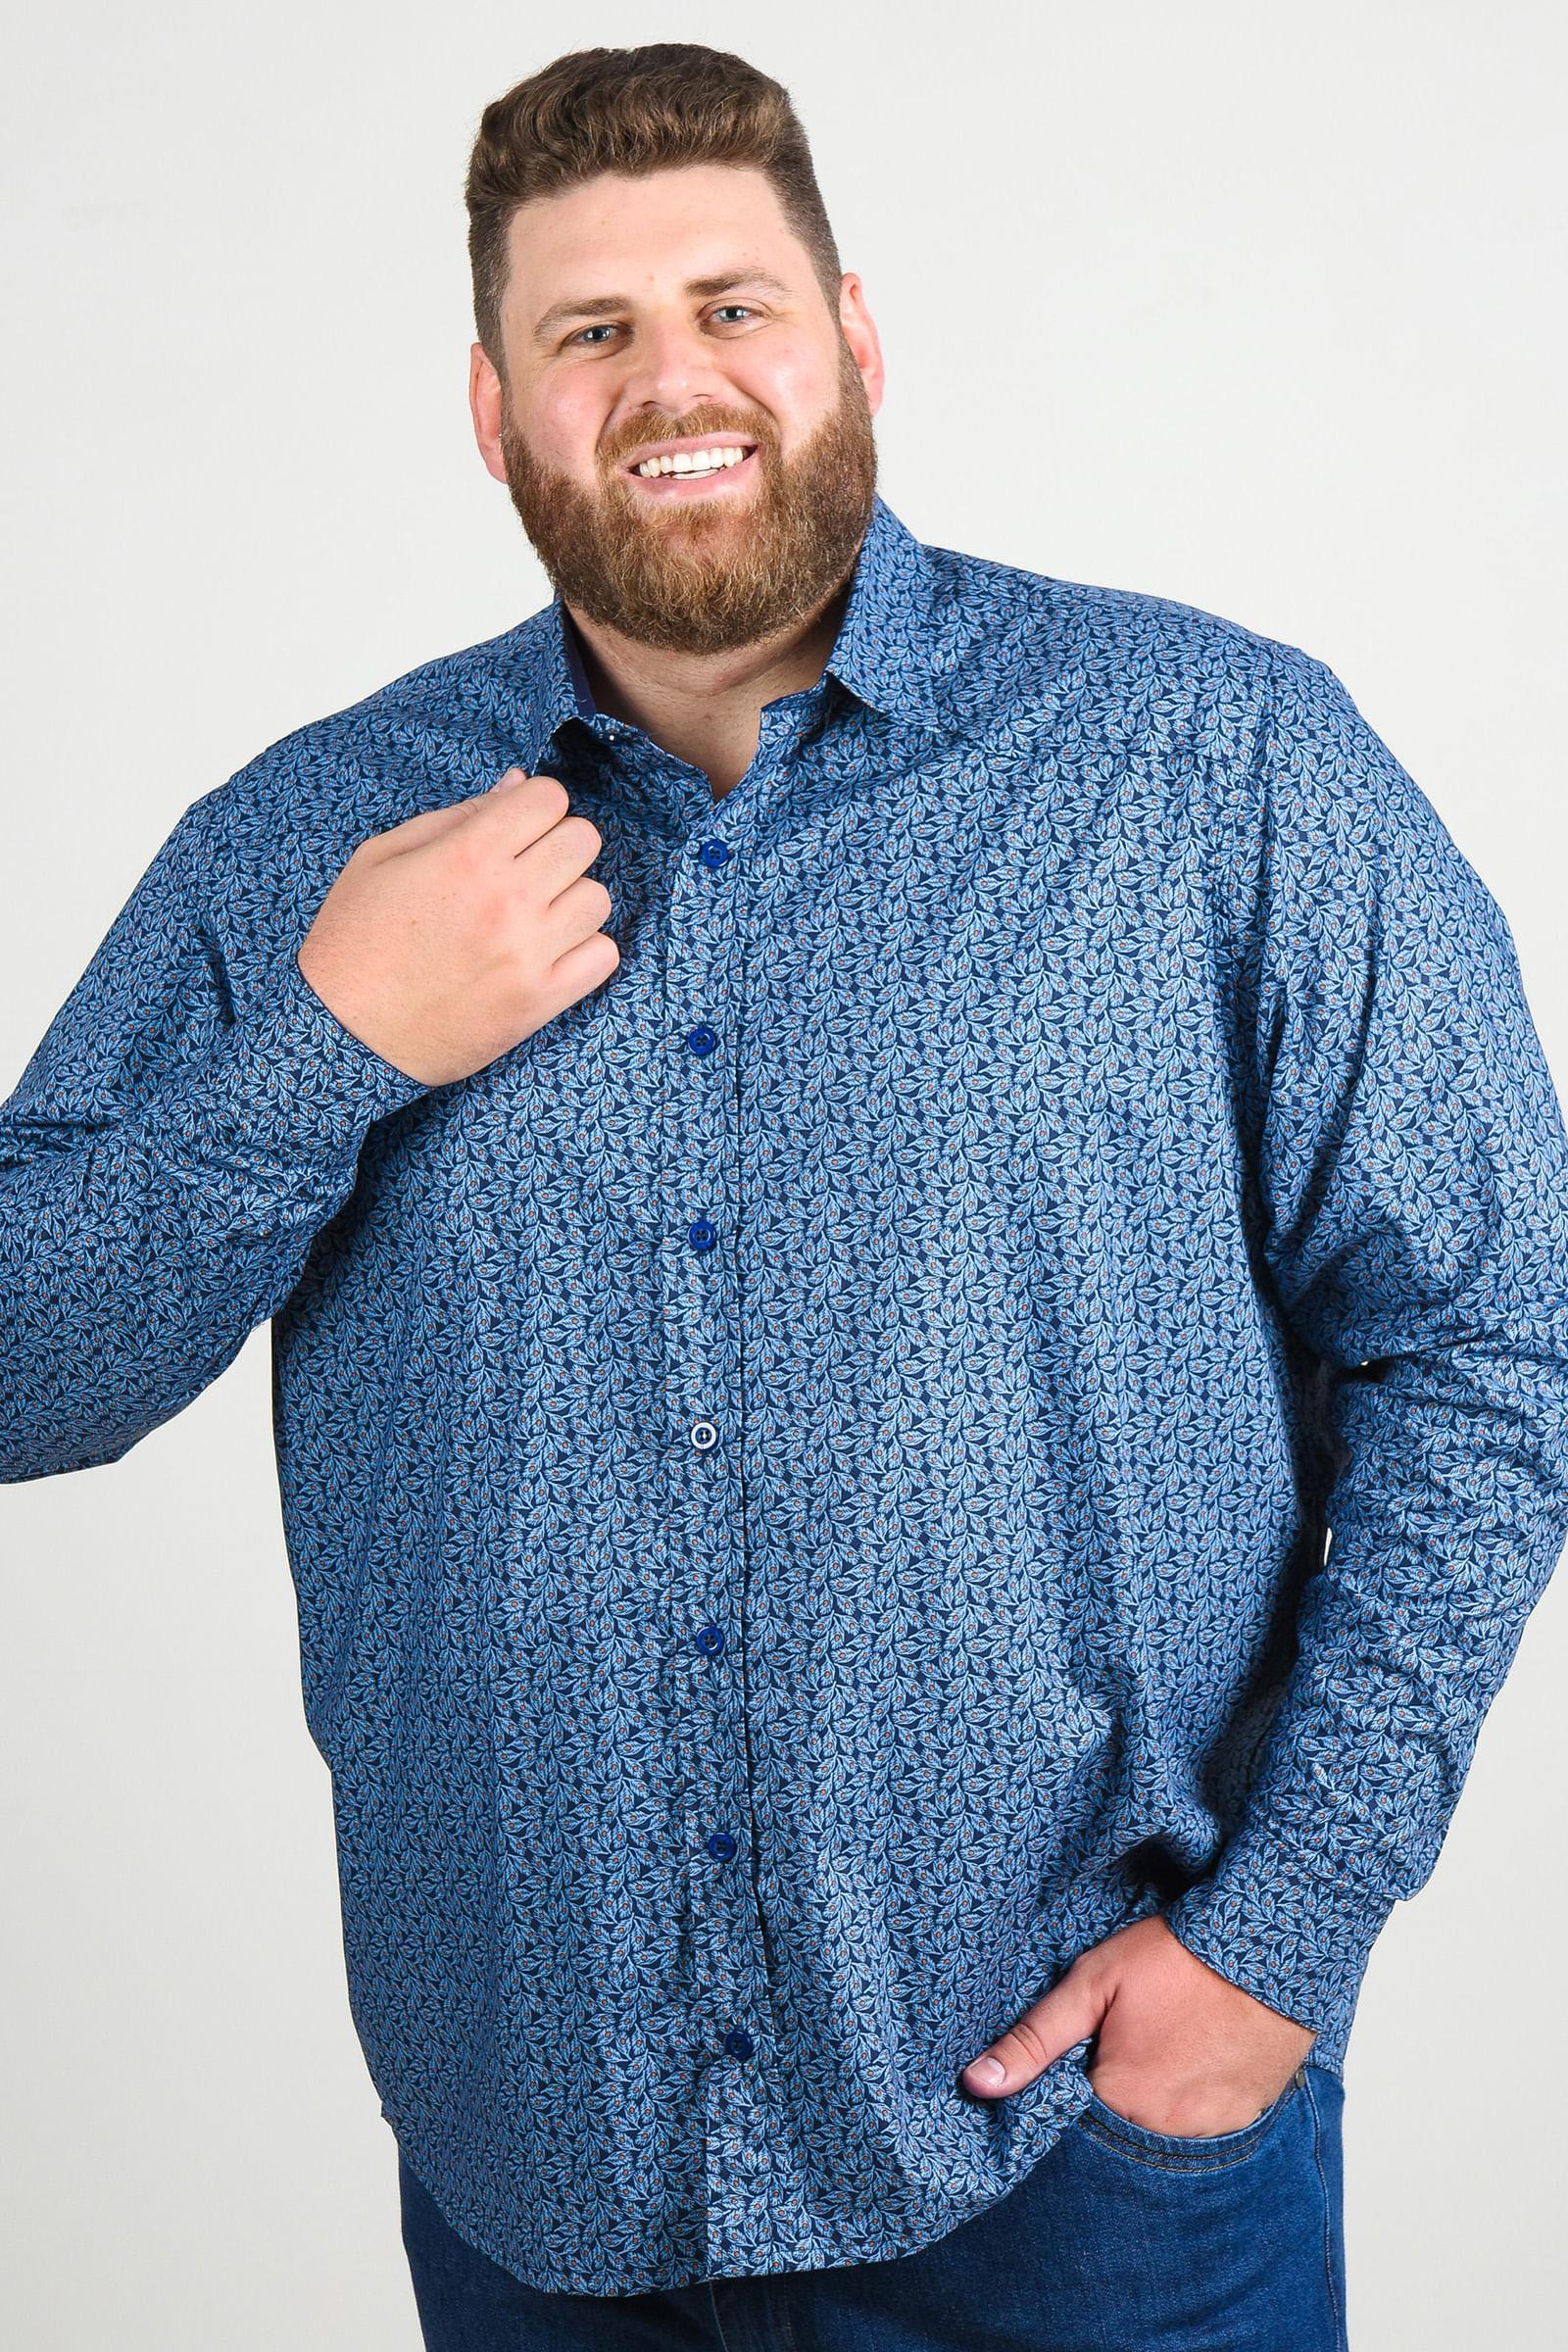 Camisa estampa de flores manga longa plus size azul